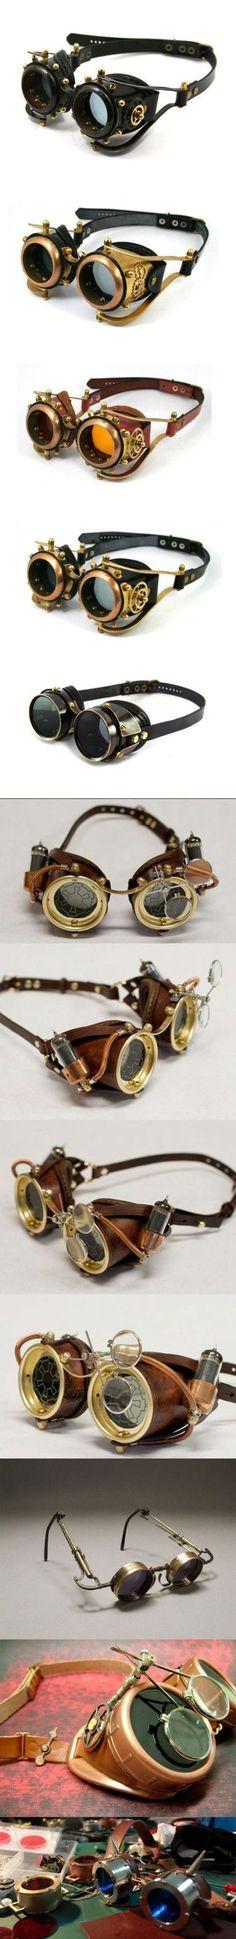 ca0179cb162e2 Cool  steampunk  eyewear. I d wear these while ridding my bike  steampunkeer